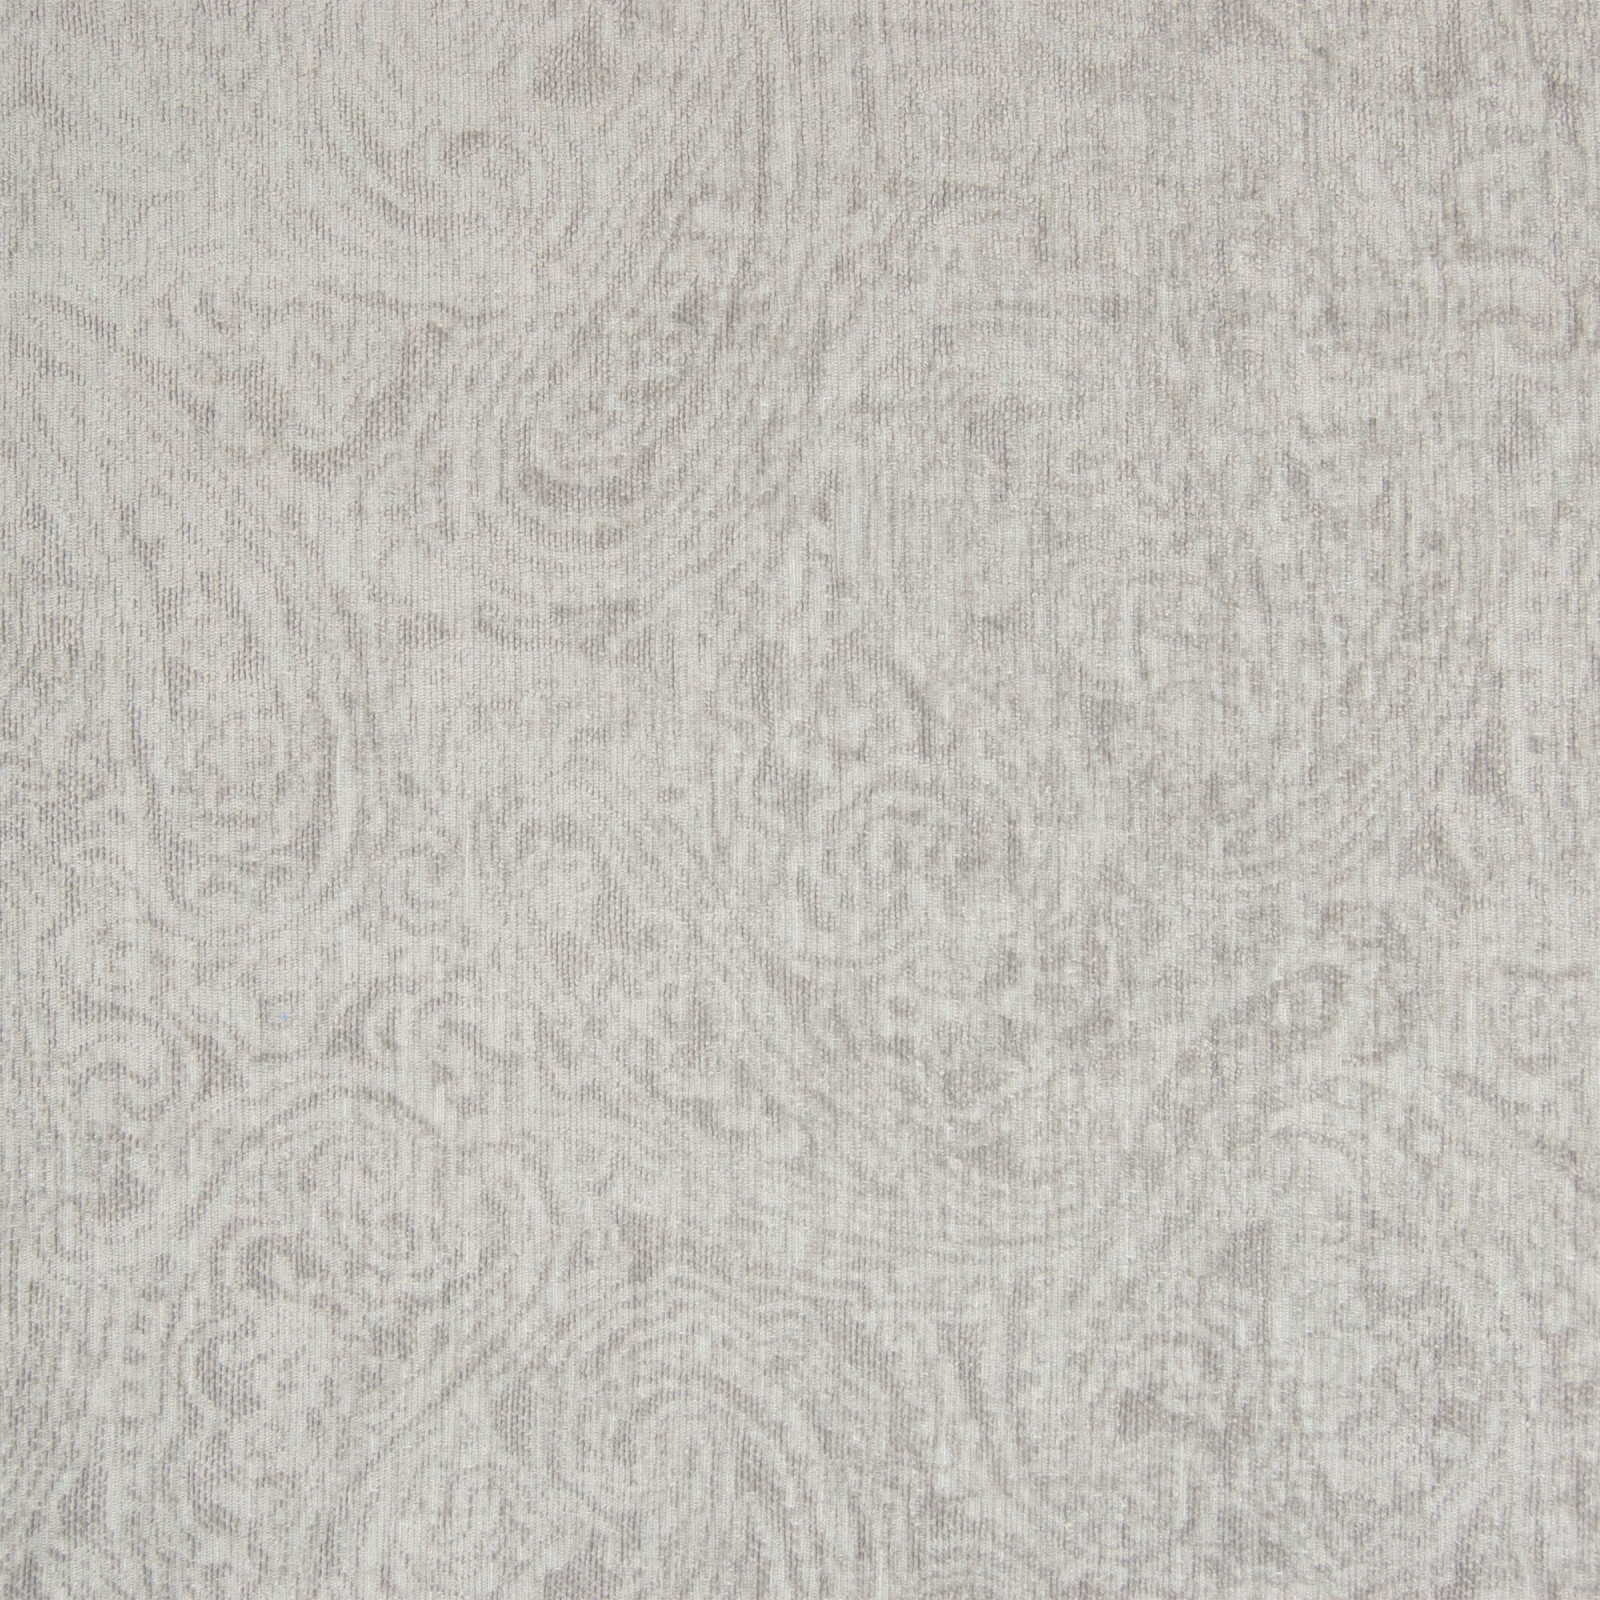 Polar Gray Solid Jacquard Upholstery Fabric